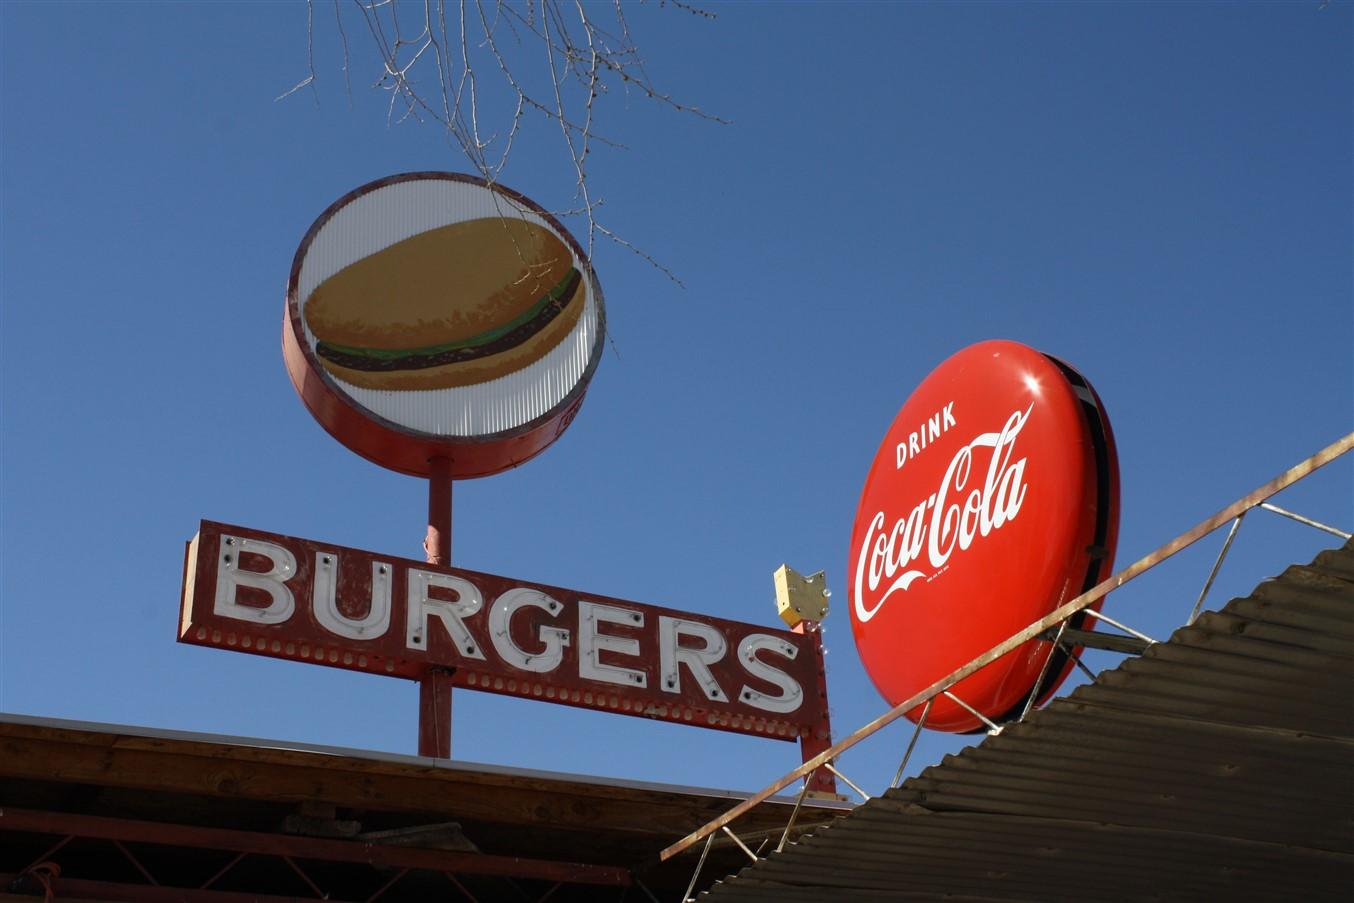 2012 03 14 Route 66 Road Trip 188 Seligman Arizona.jpg